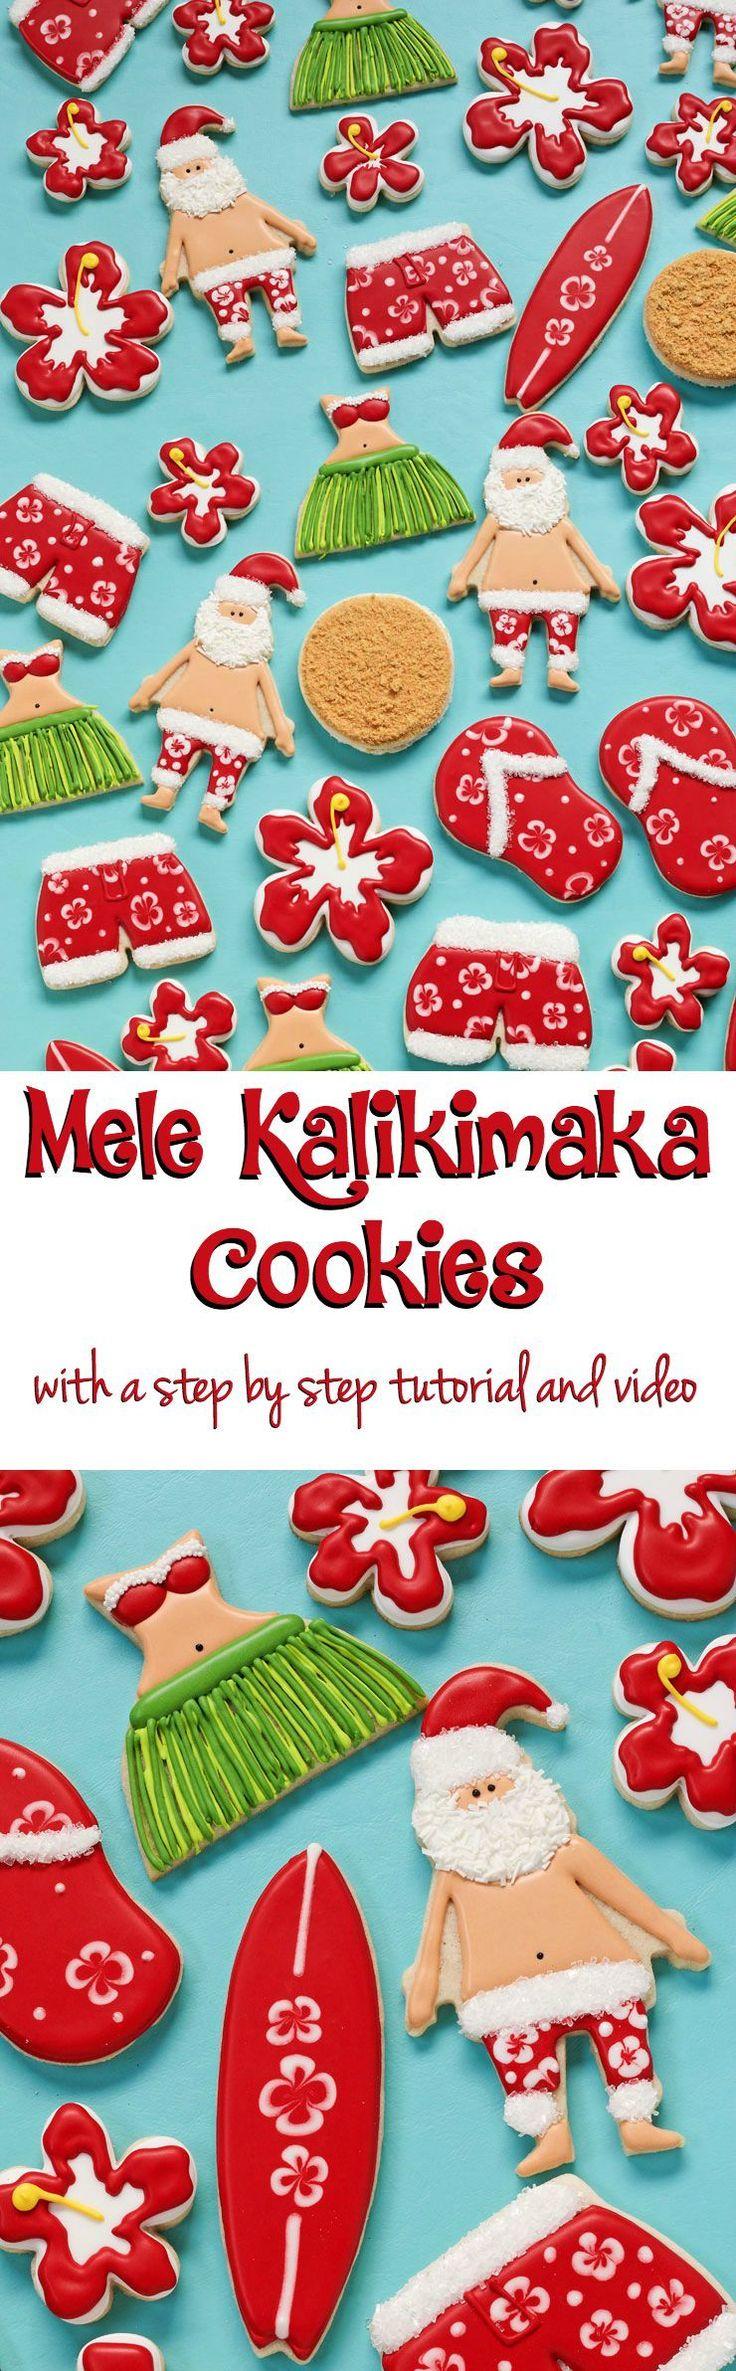 Mele Kalikimaka Cookies are Easy to Make when You Follow this Tutorial via www.thebearfootbaker.com